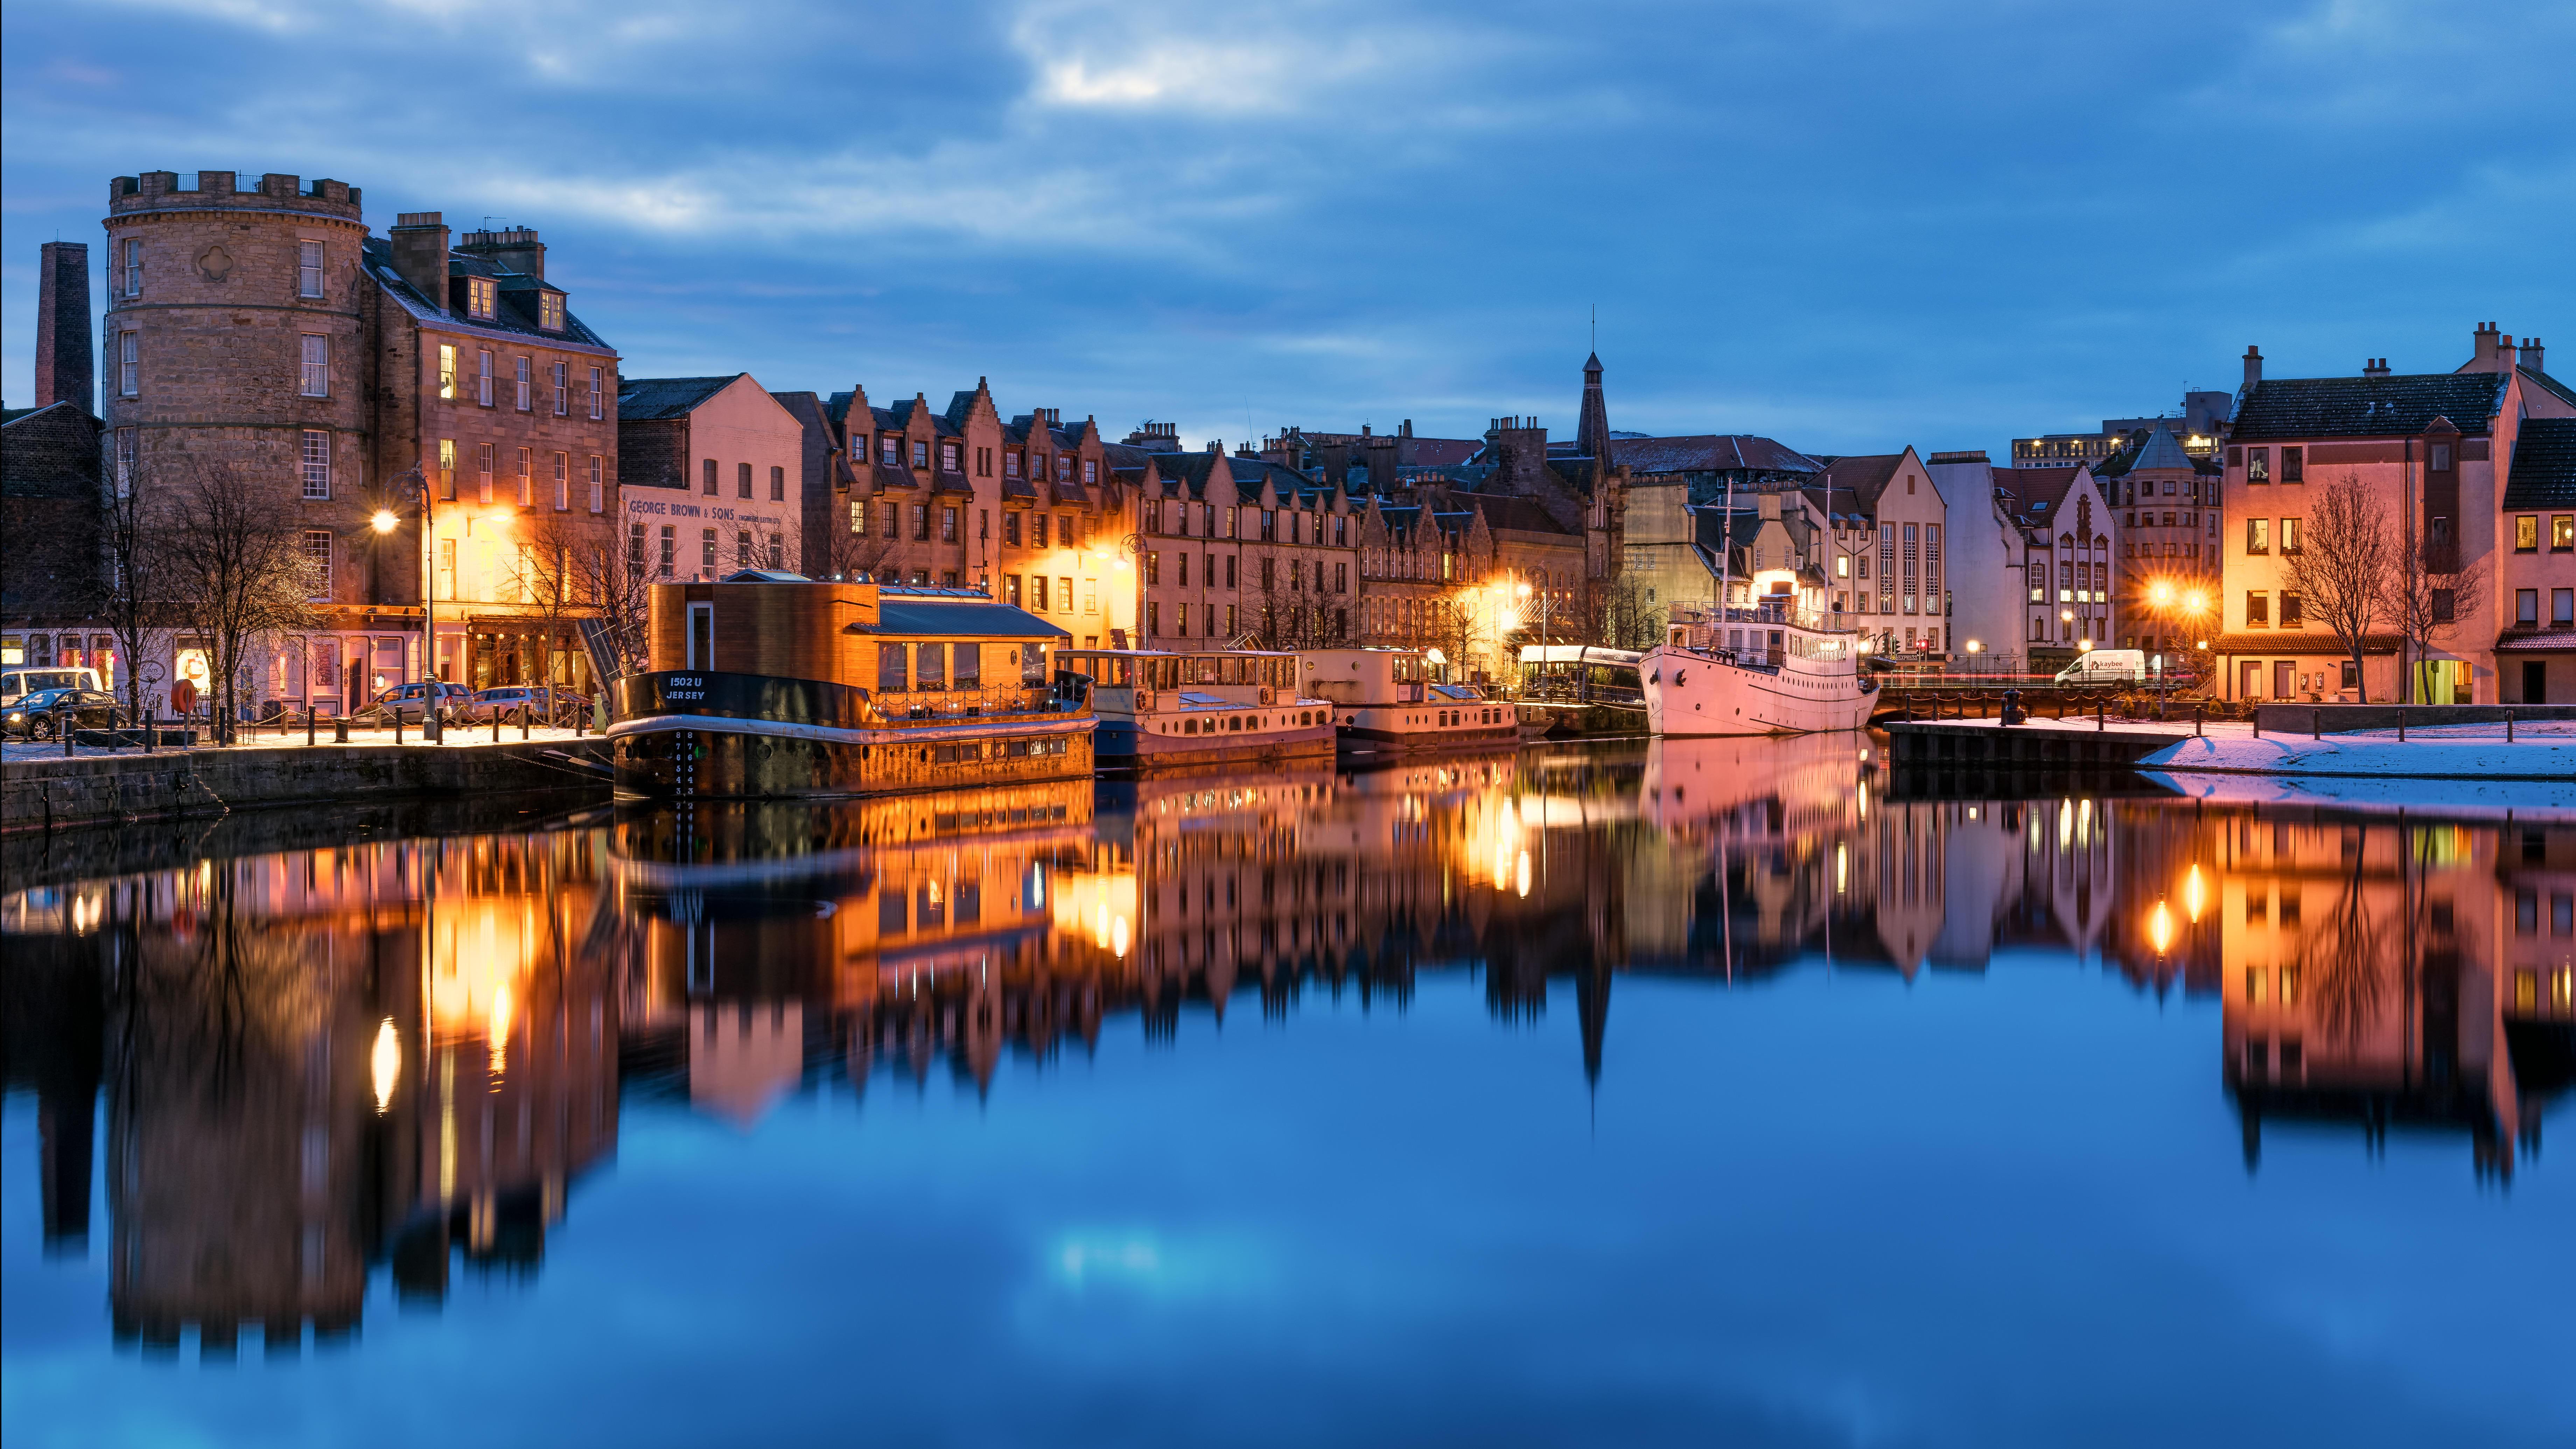 The Shore, Leith, Edinburgh, Scotland, United Kingdom, Europe